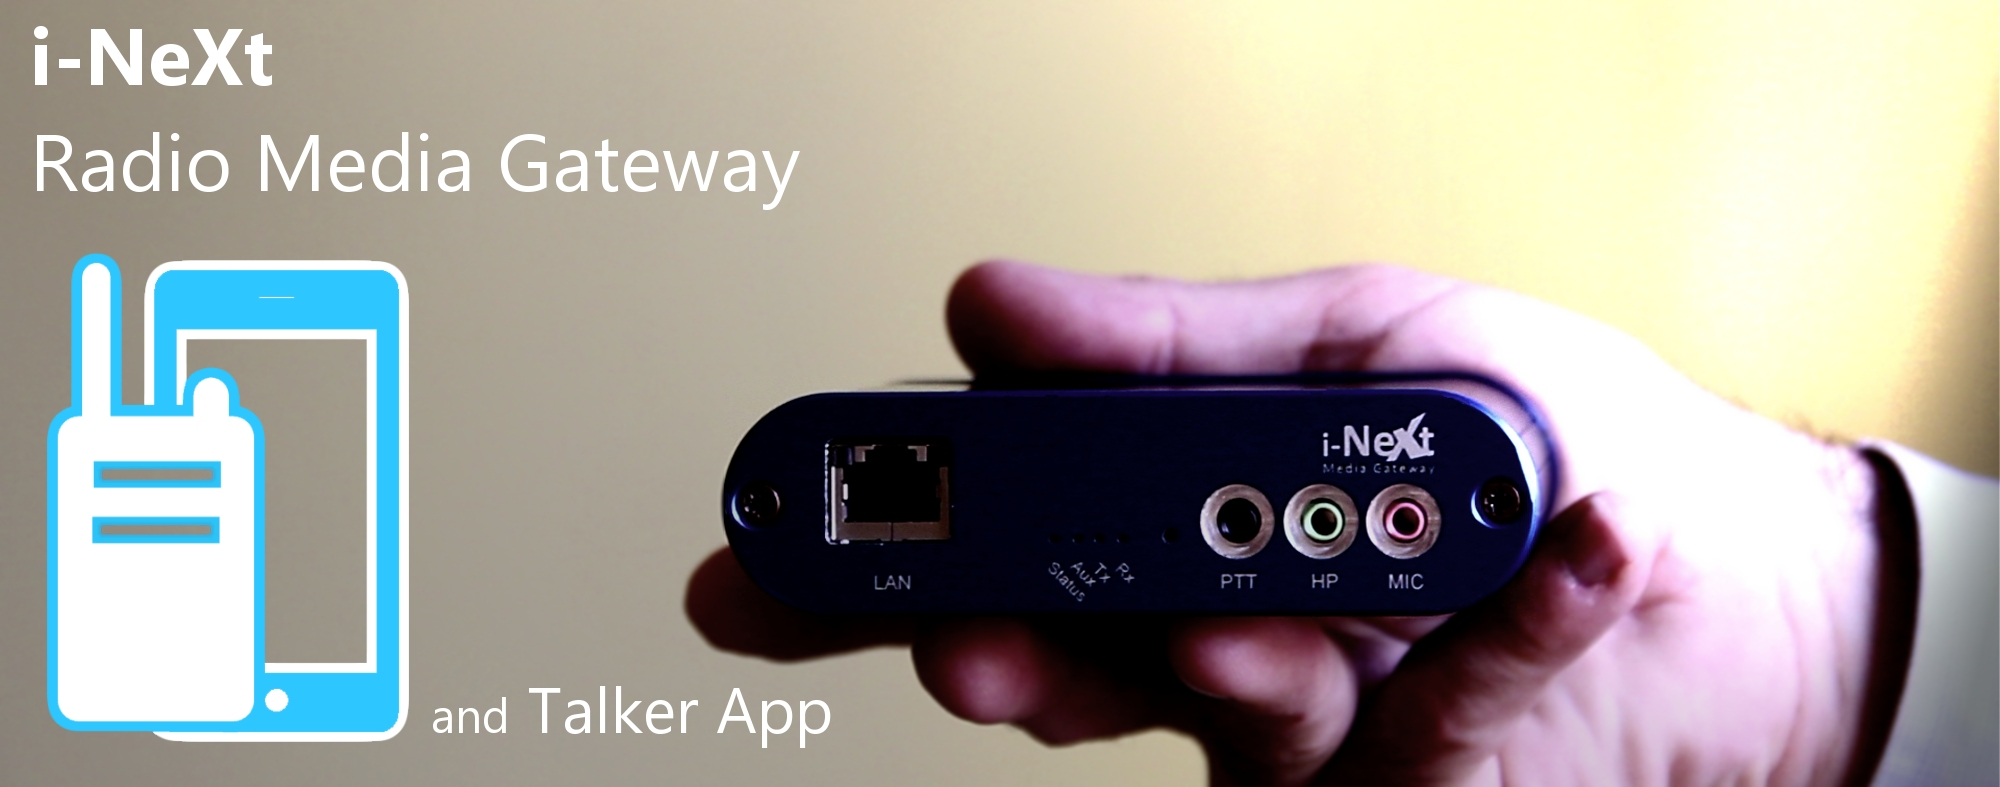 i-Next Radio Media Gateway and Talker app